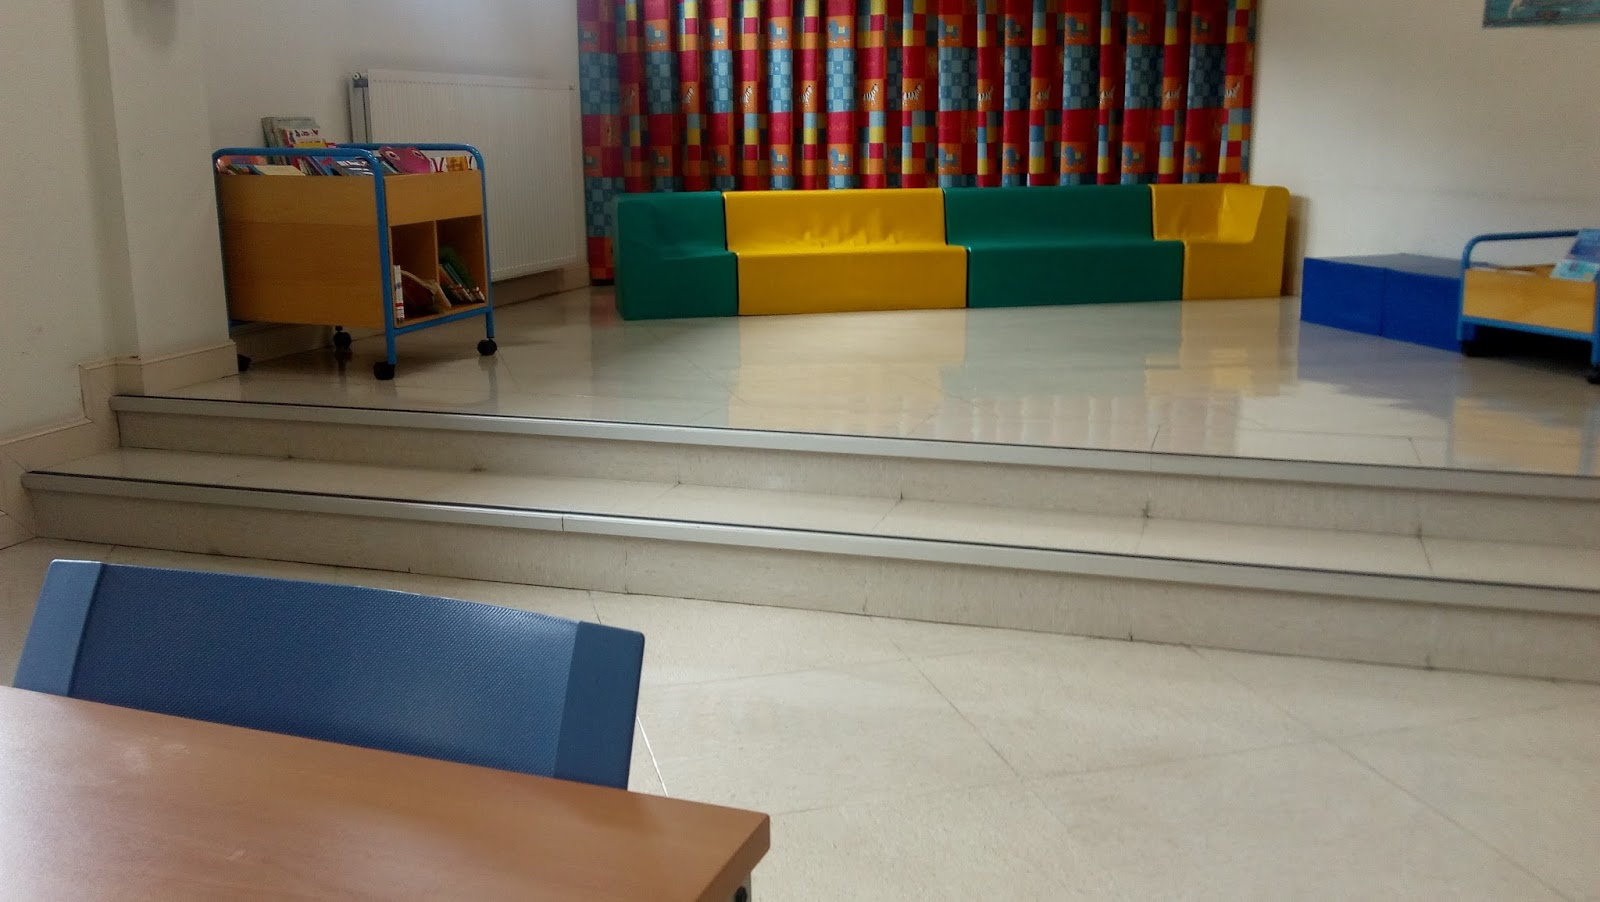 Bibliotecas Infantiles ~ Estanterias Para Libros Infantiles